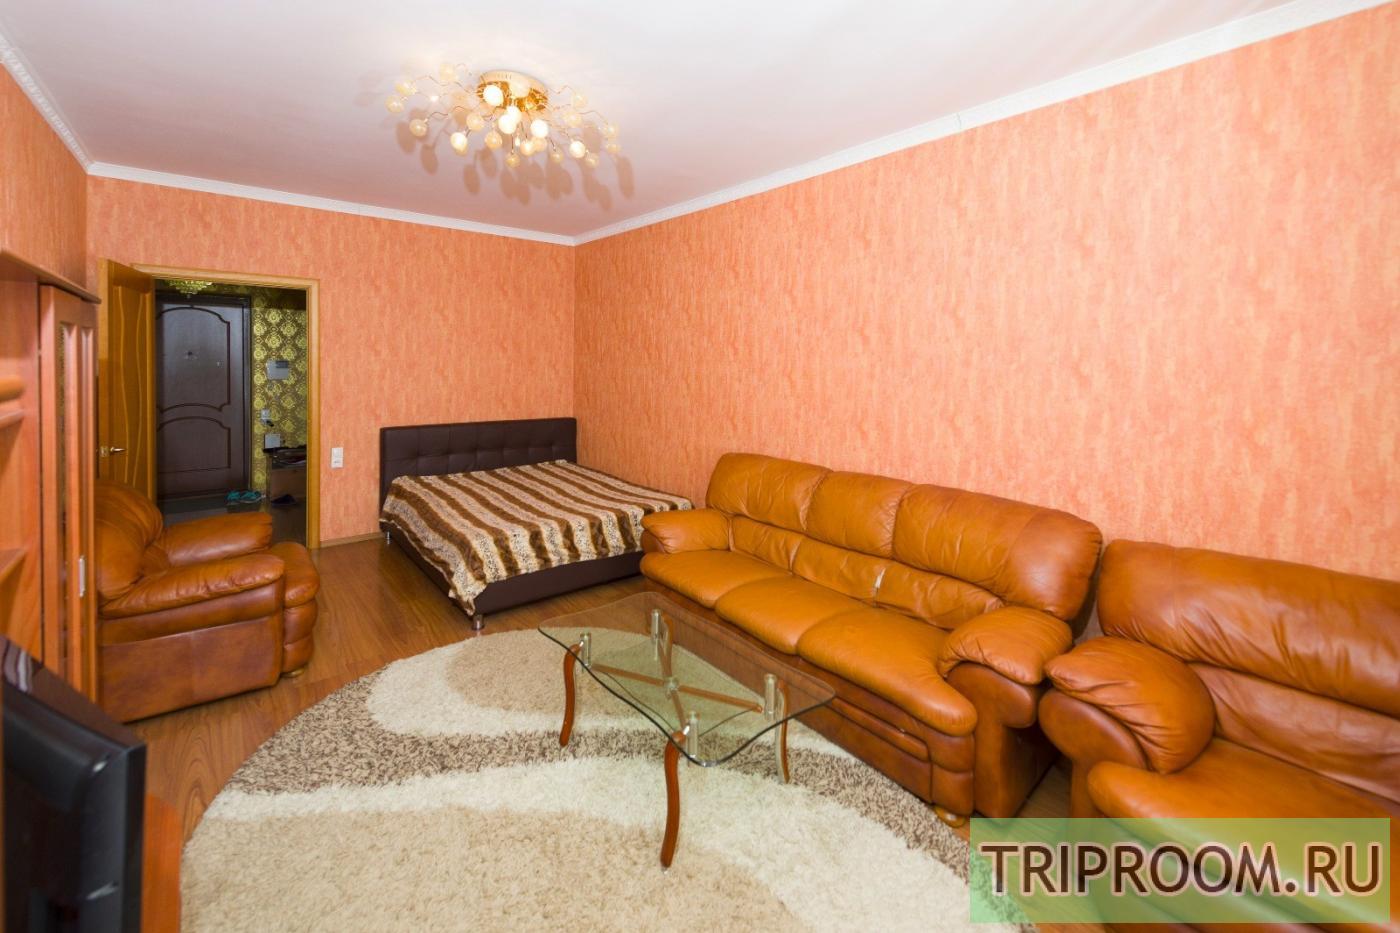 2-комнатная квартира посуточно (вариант № 2850), ул. Габдуллы Тукая улица, фото № 10